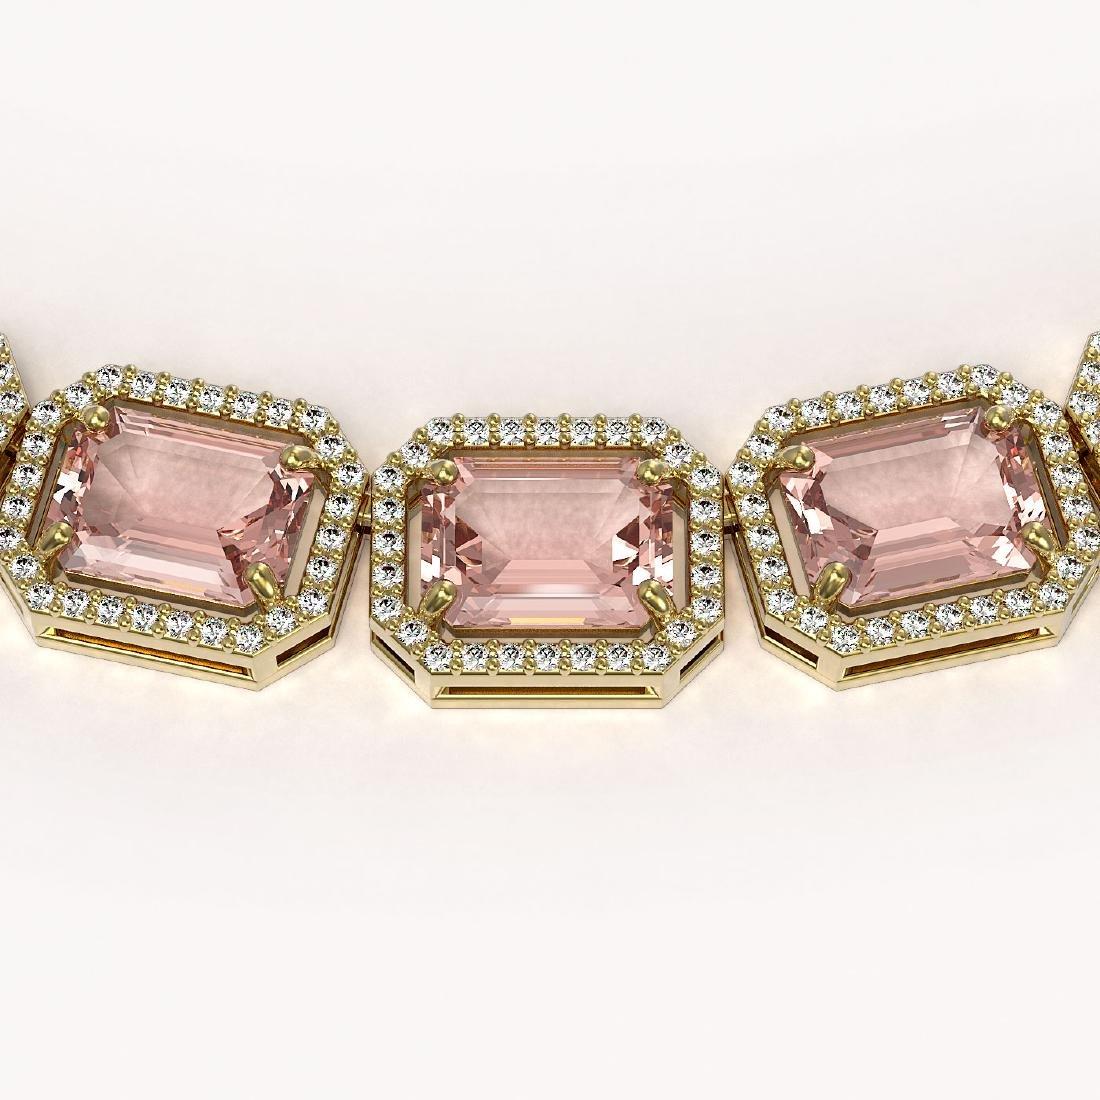 81.64 CTW Morganite & Diamond Halo Necklace 10K Yellow - 2